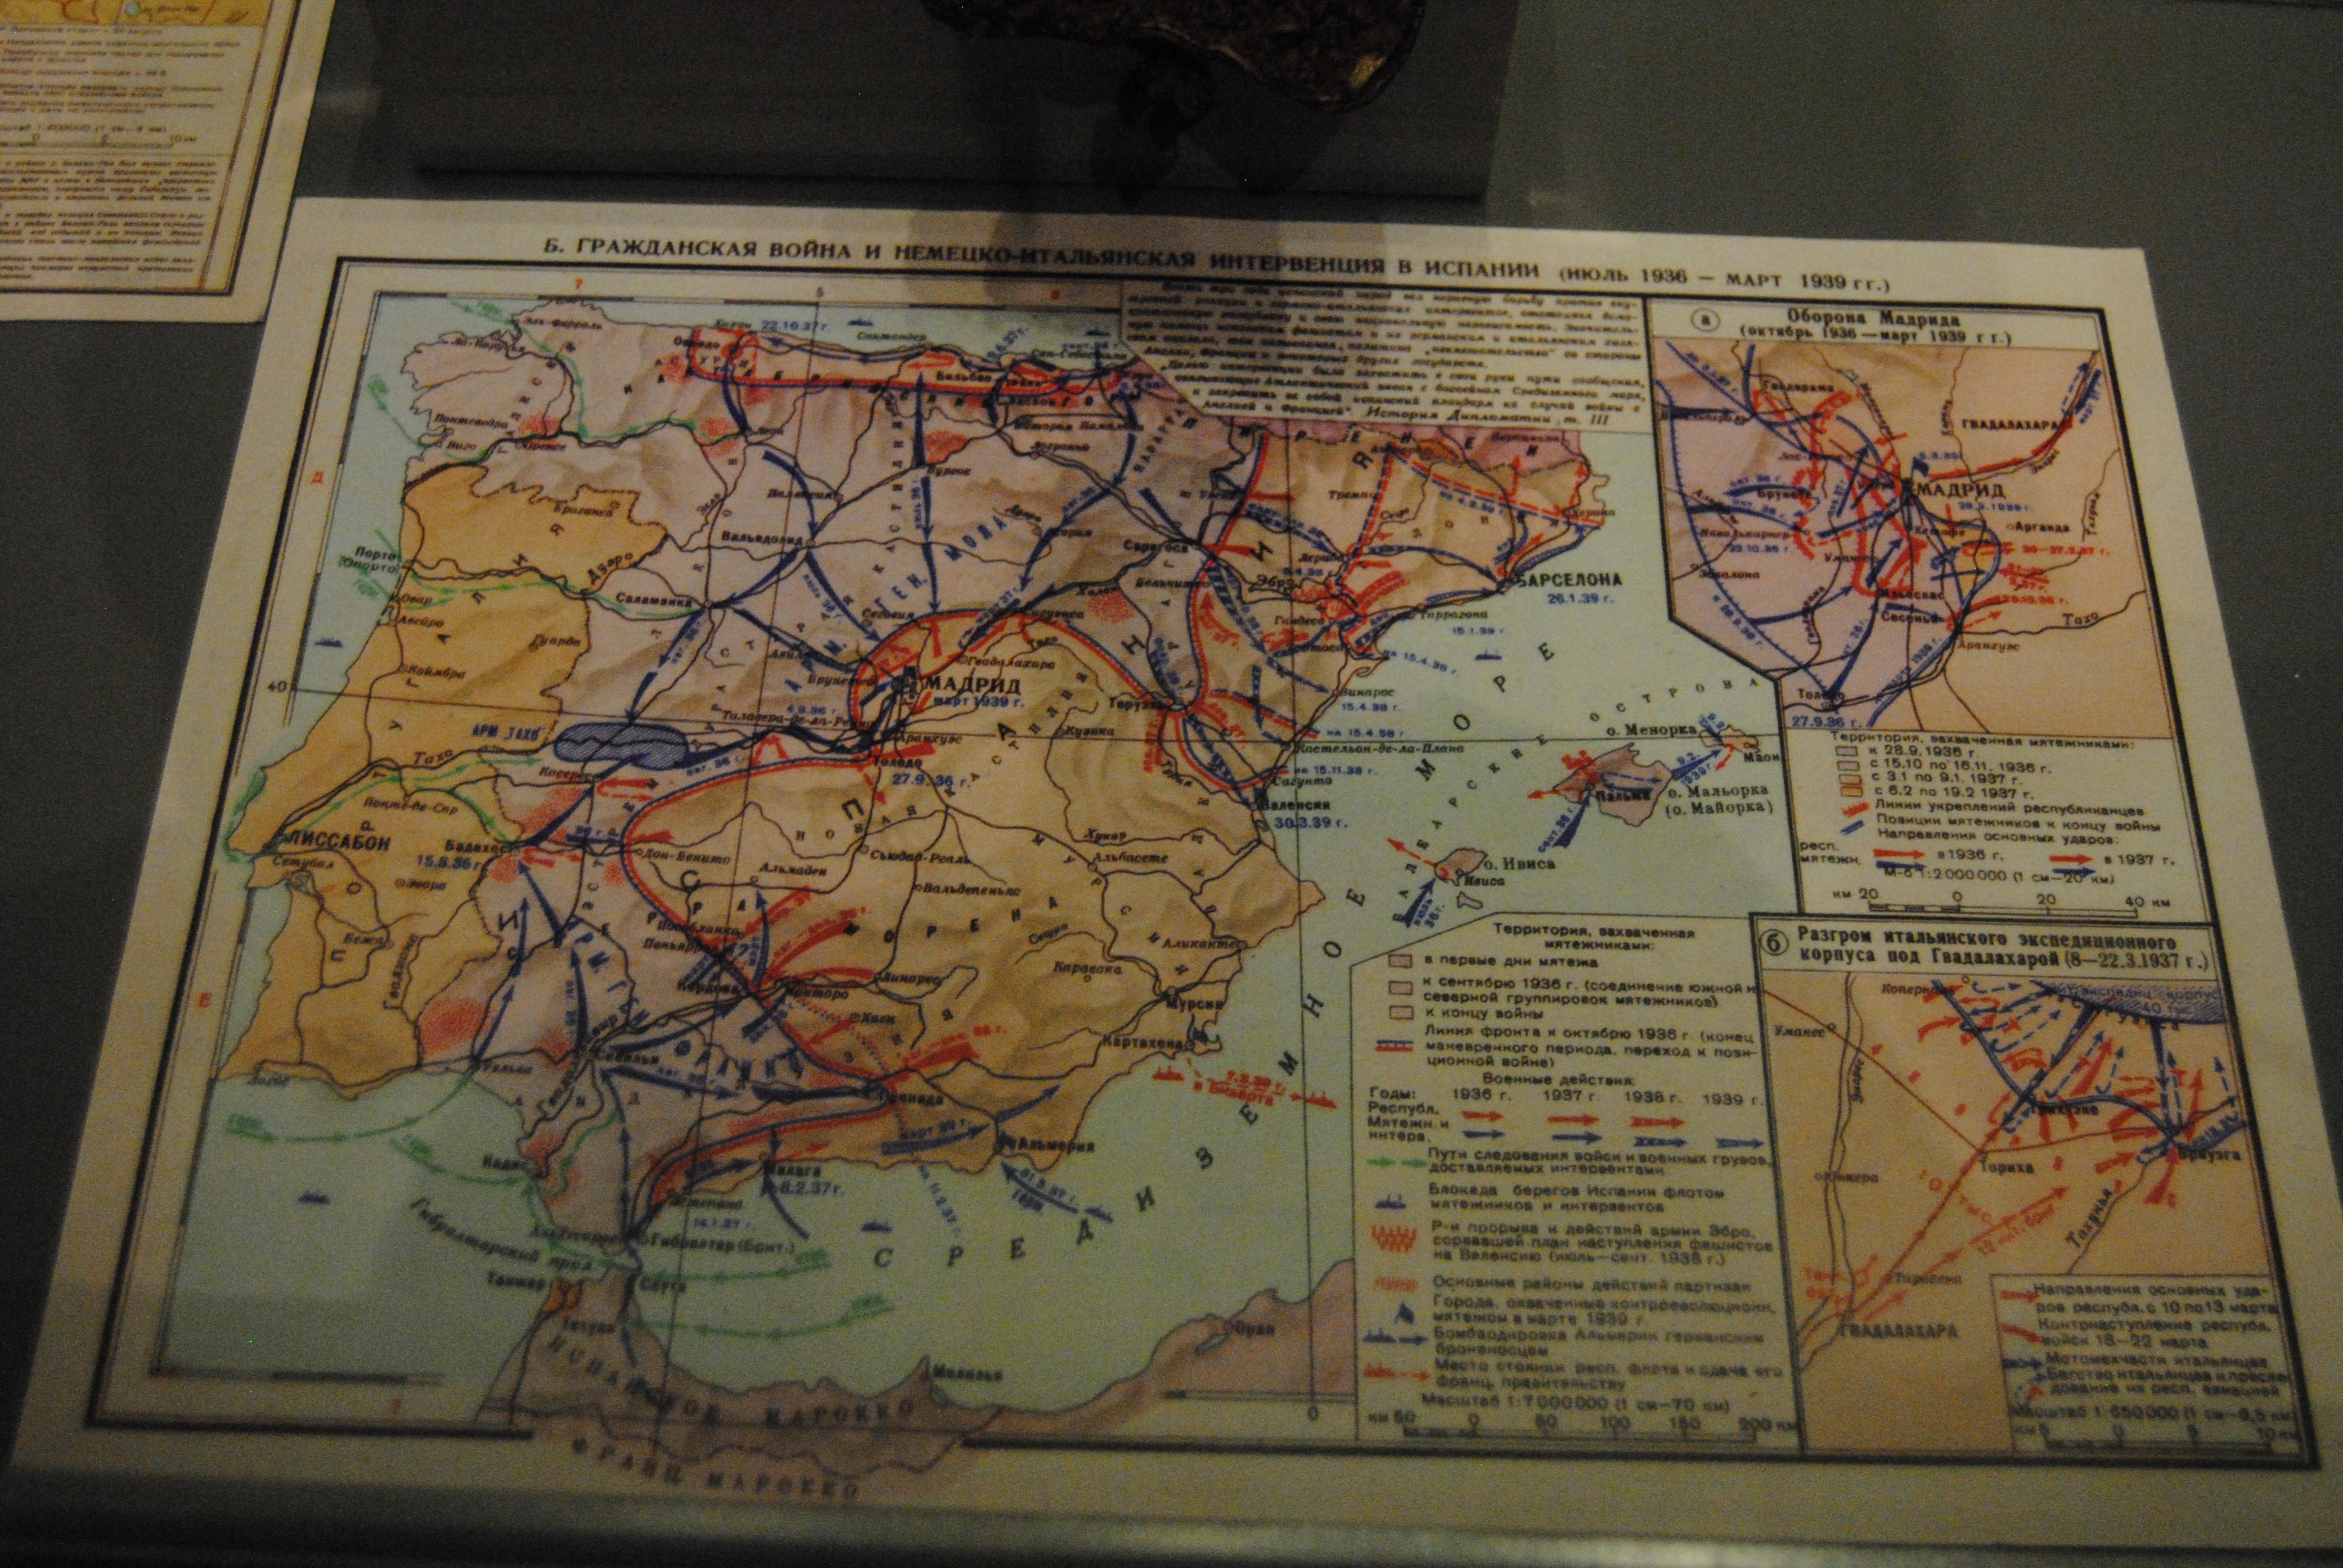 mapa de la Guerra Civil Española en el Museo de la Gran Guerra Patriótica de Minsk